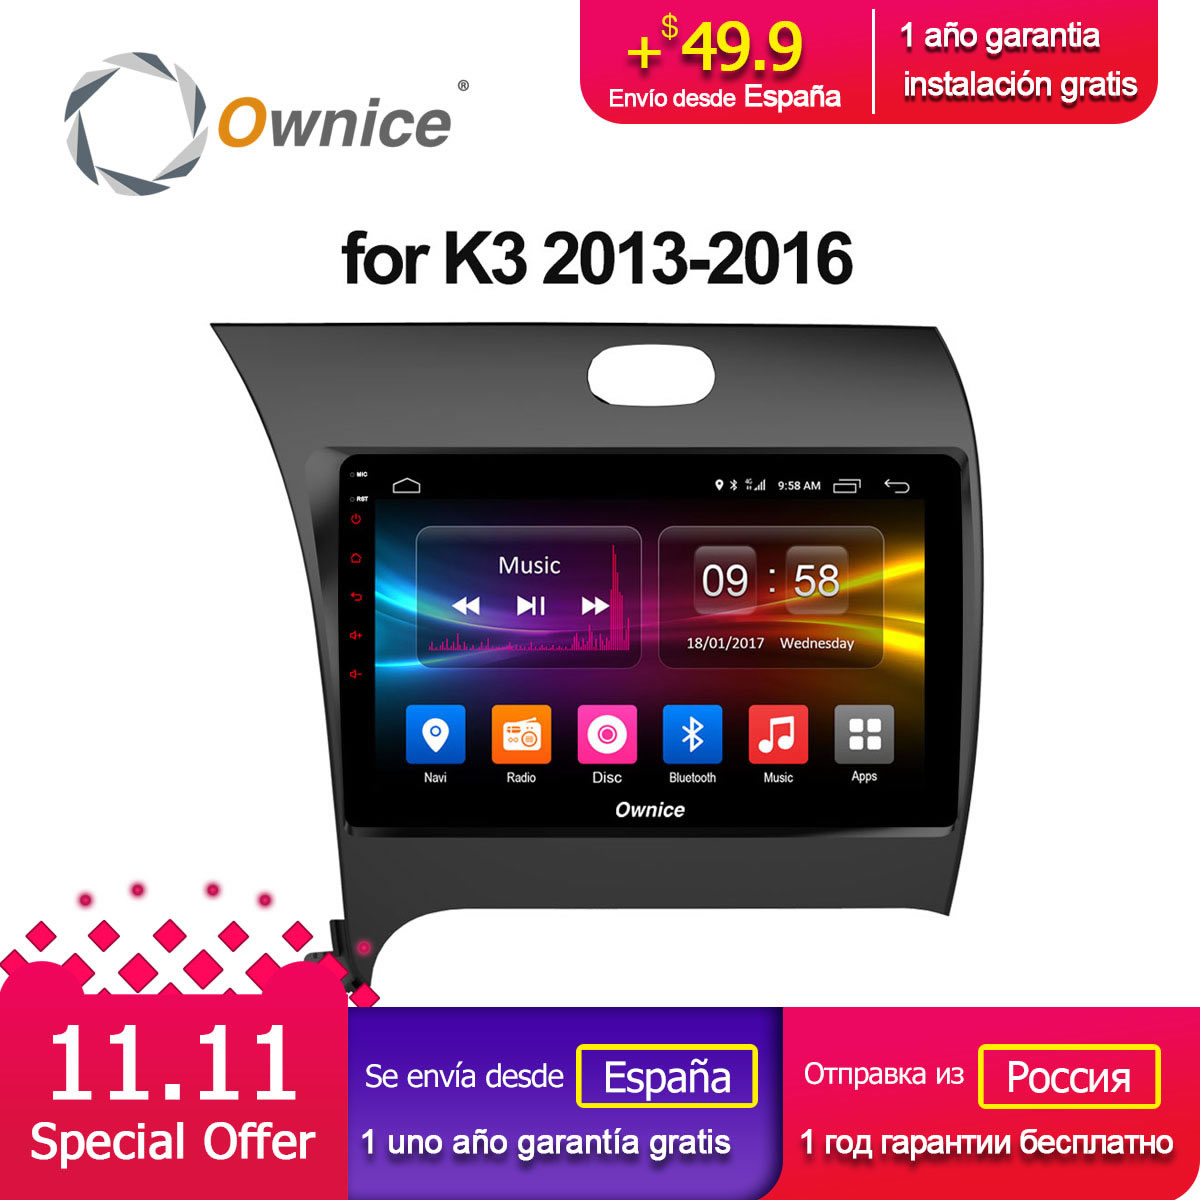 Ownice C500+ G10 Android 8.1 Octa 8 core 2GB RAM 32GB ROM Car Radio GPS dvd player for Kia CERATO K3 FORTE 2013 2014 2015 2016 ownice c500 android 6 0 octa 8 core car dvd player for suzuki grand vitara android 6 0 wifi 4g gps bt radio 2gb ram 32gb rom